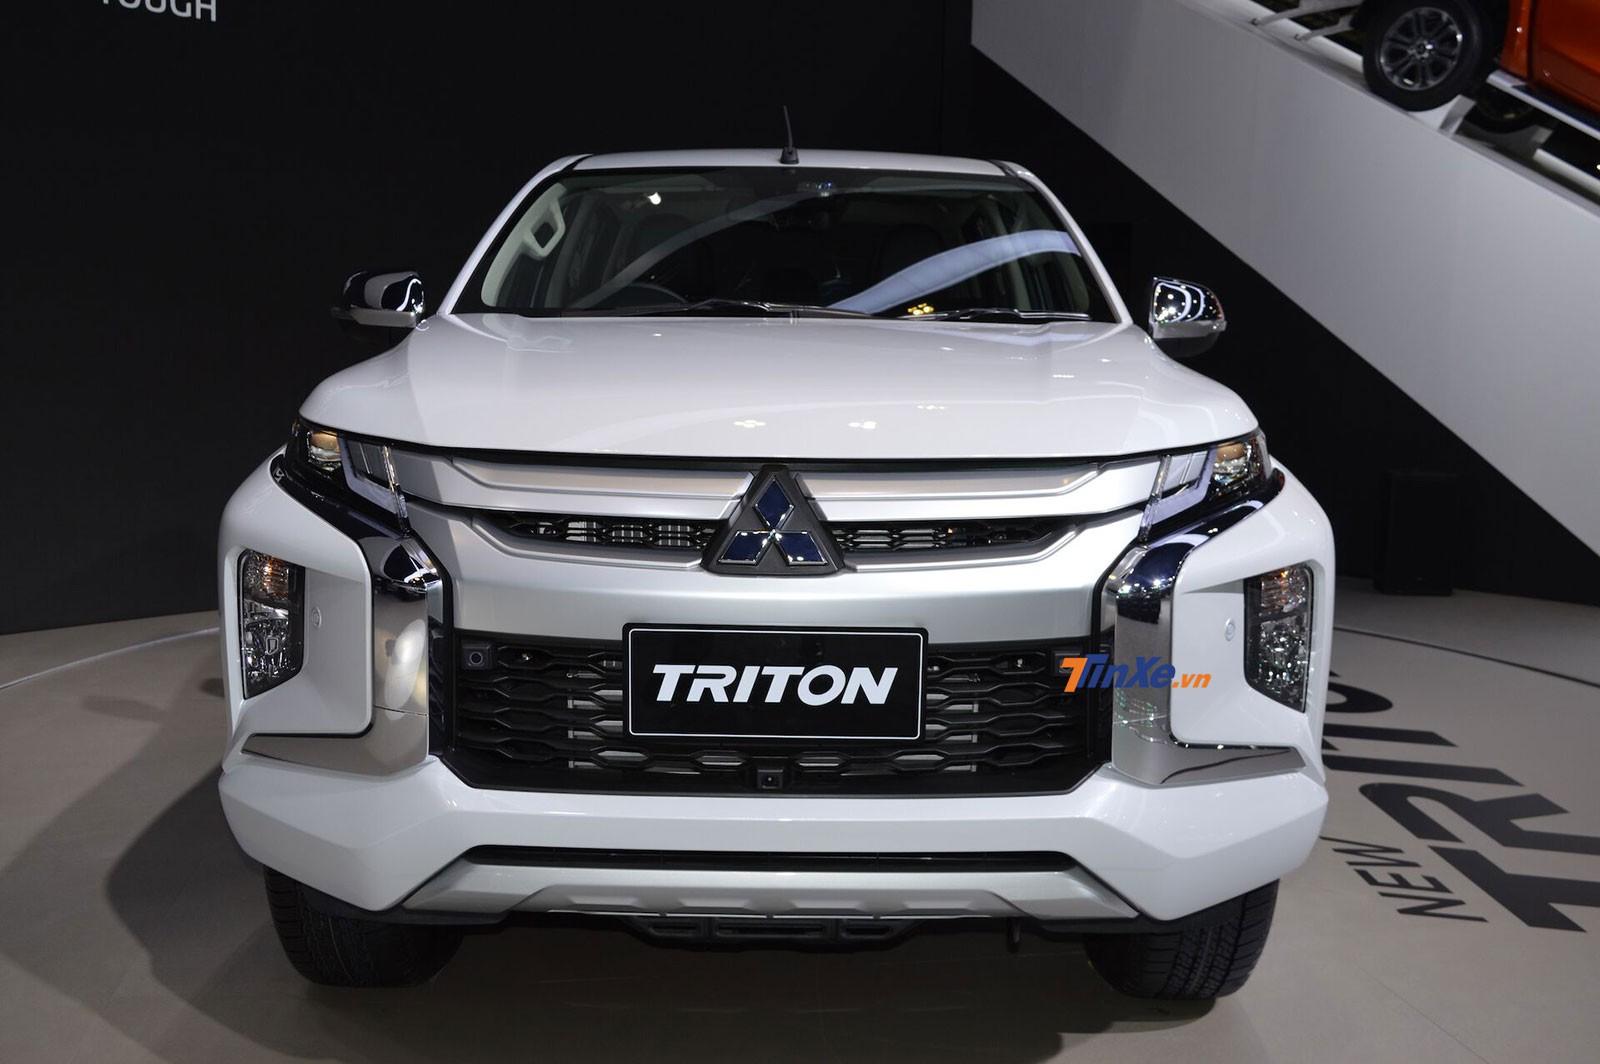 Cận cảnh thiết kế đầu xe của Mitsubishi Triton 2019